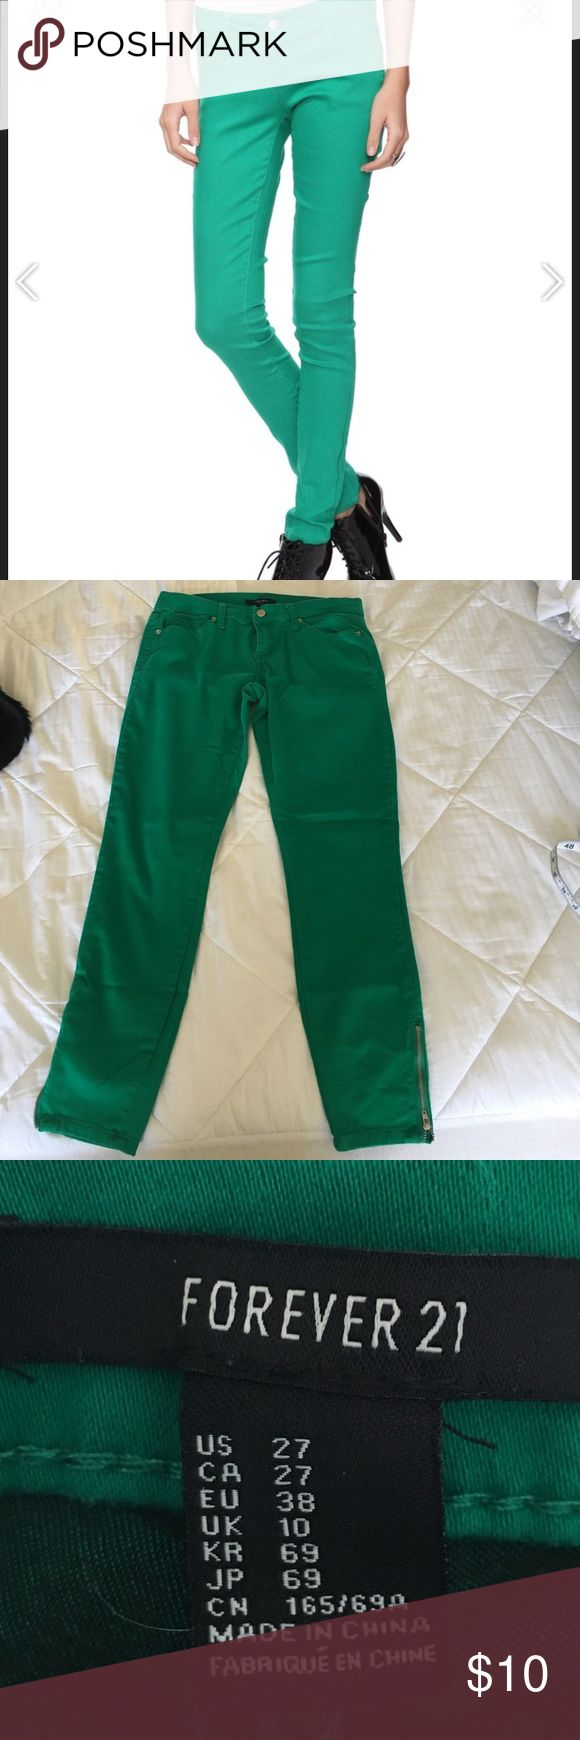 🌴💙Kelly green skinny jeans forever21 sz 27 🌴💙Kelly green skinny jeans forever21 sz 27 Forever 21 Jeans Skinny